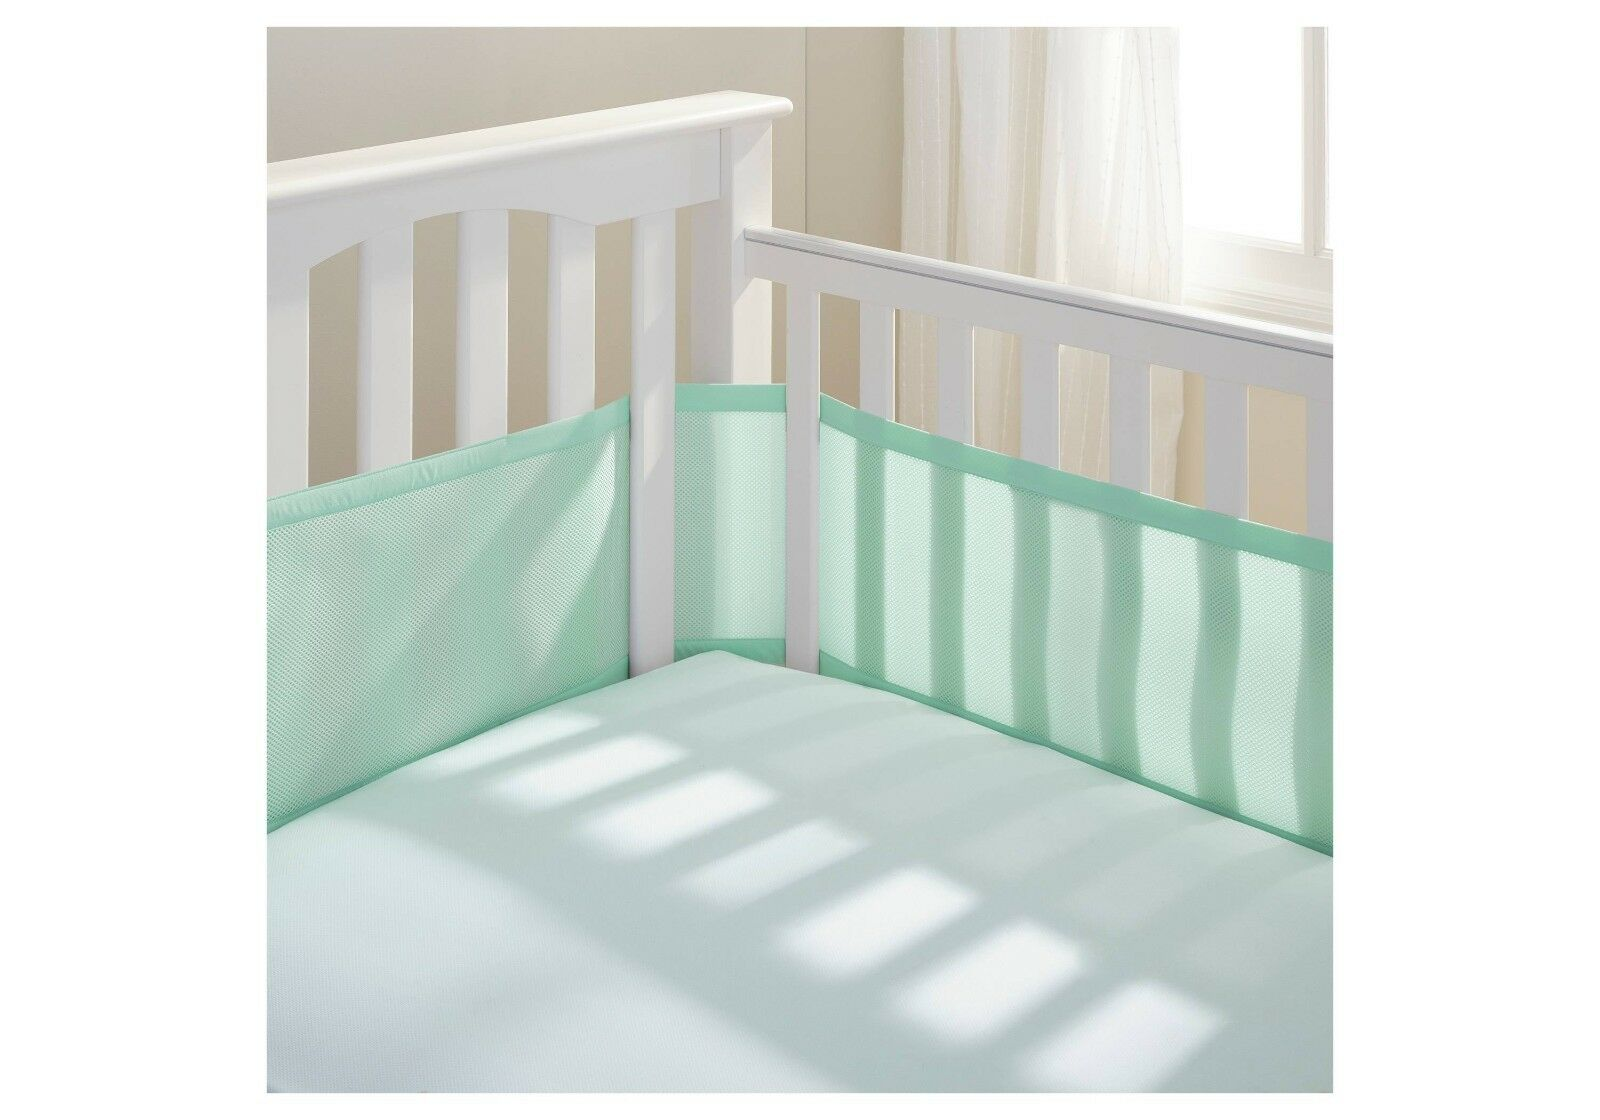 NEW Breathable Baby Mesh Crib Liner Mint Green Nursery Beddi